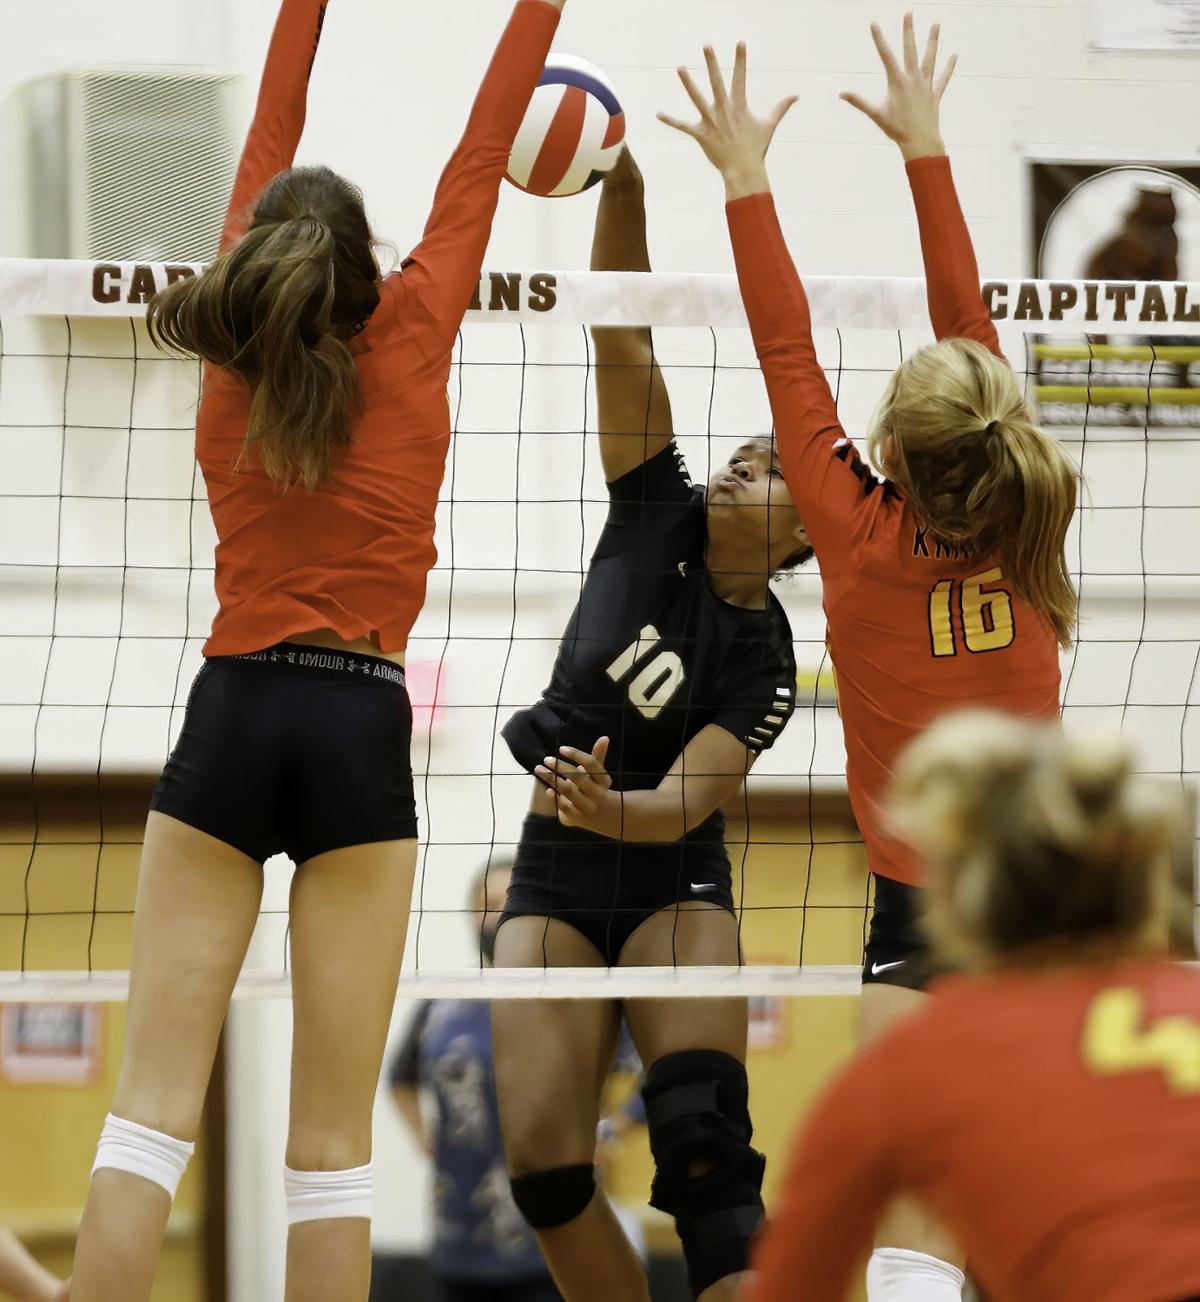 Capital High Volleyball vs Missoula Hellgate